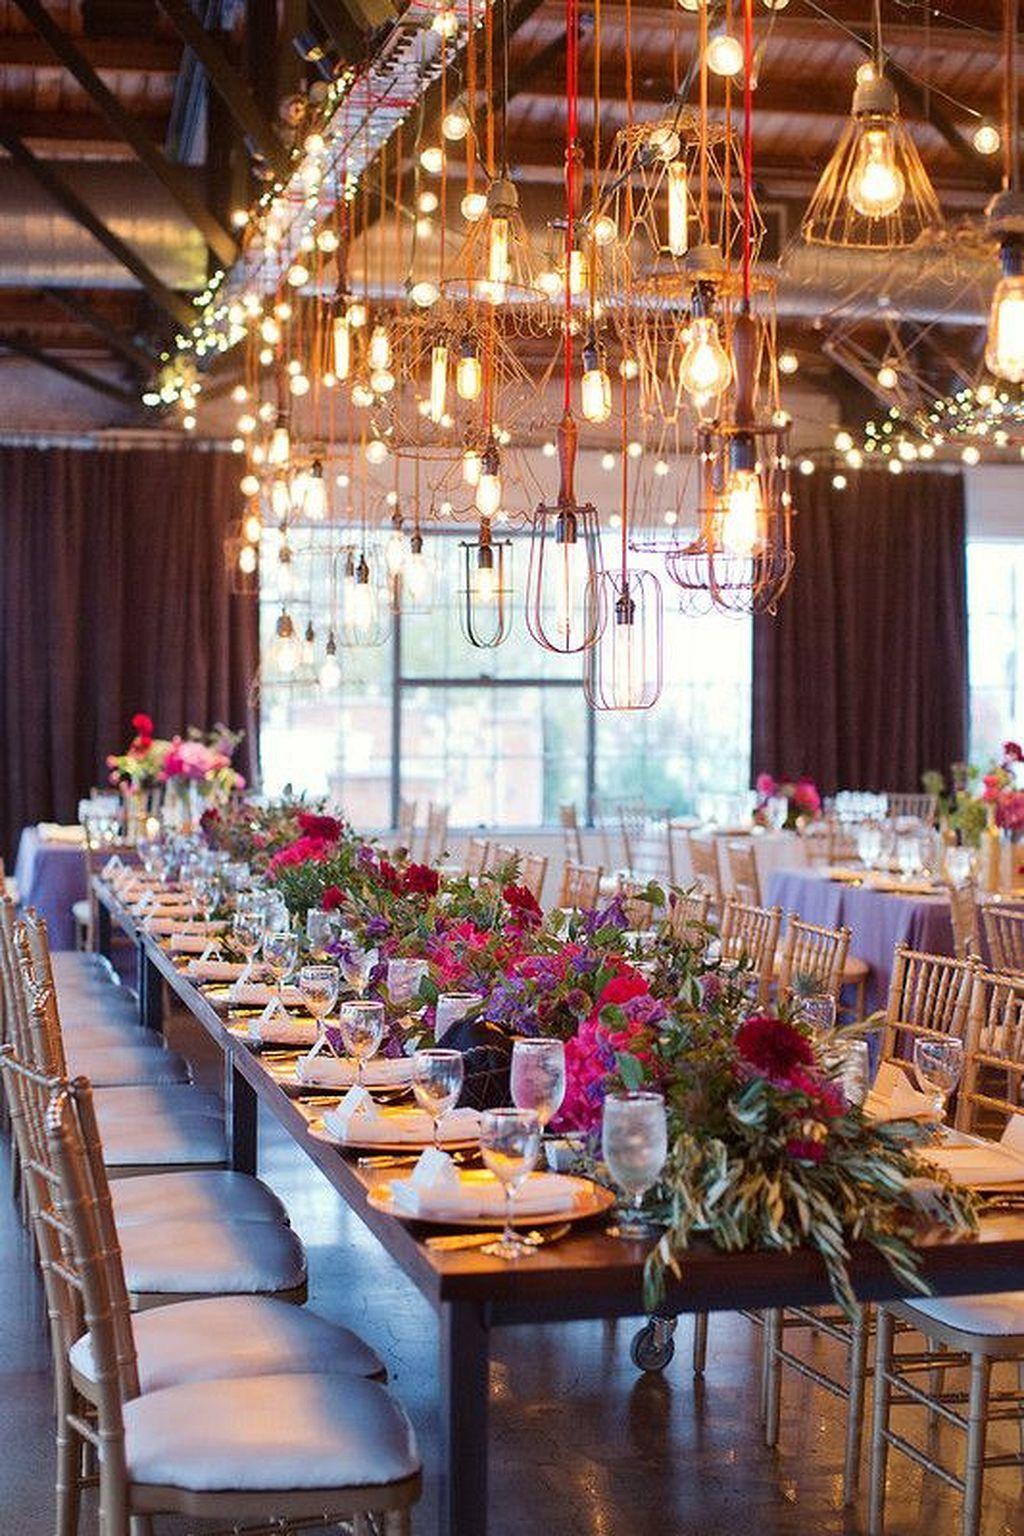 Wedding reception decoration ideas with lights   Romantic and Warm Wedding Lighting  Wedding lighting Romantic